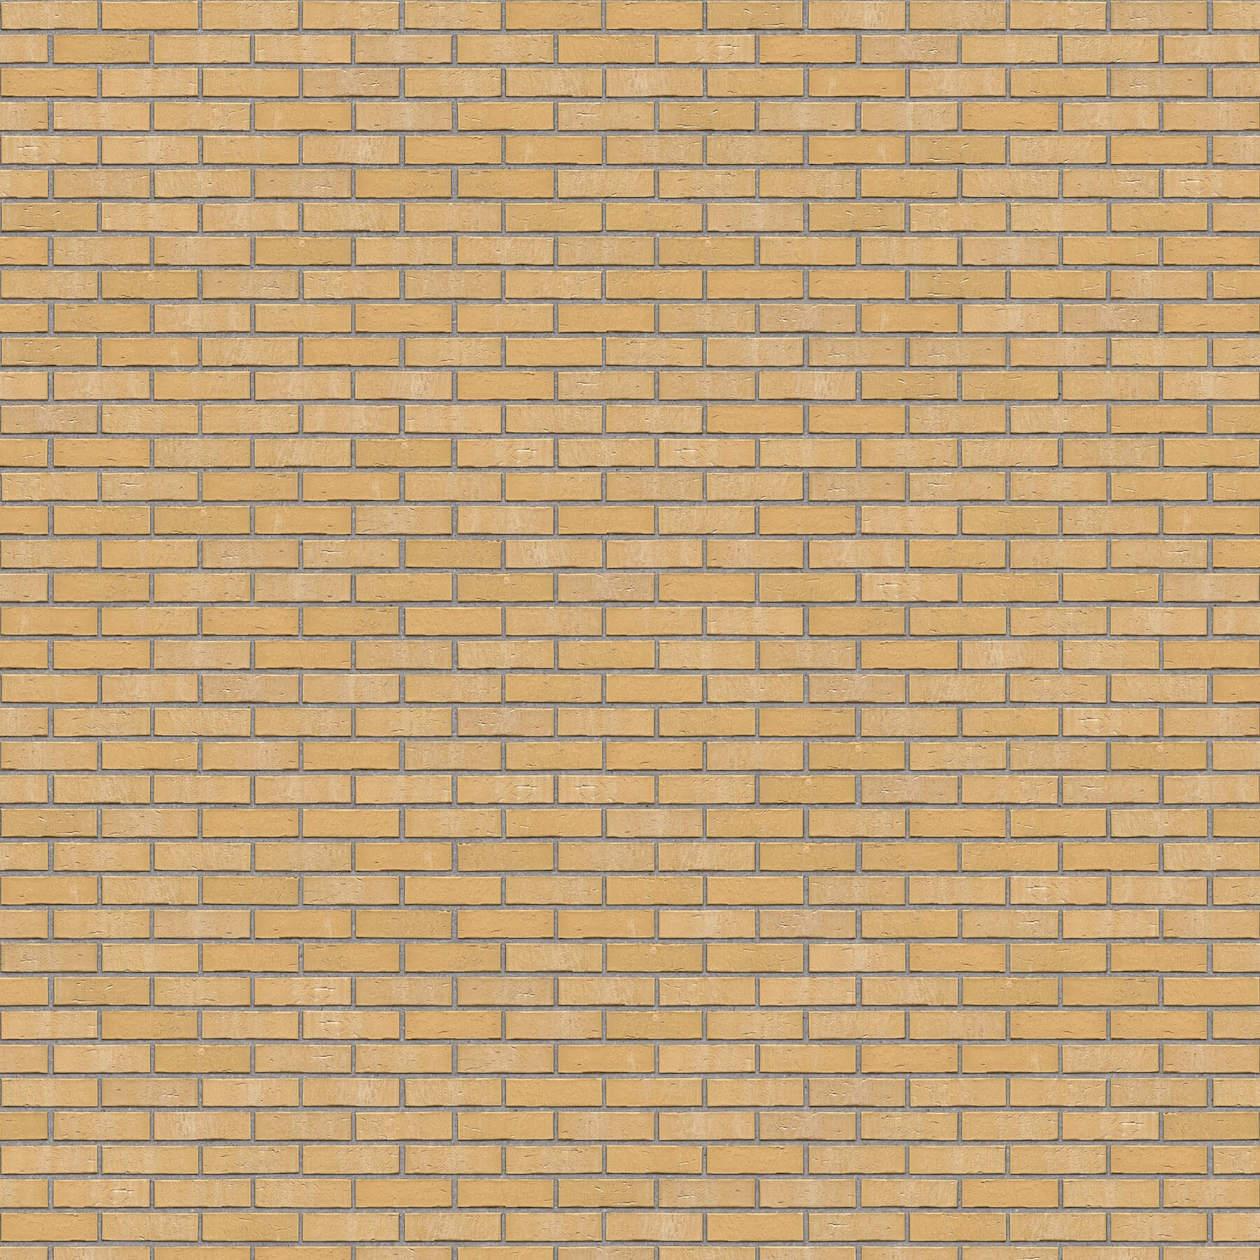 Puna-cigla-FeldHaus-Klinker-brick-house-nf-k-762-Siva Fuga